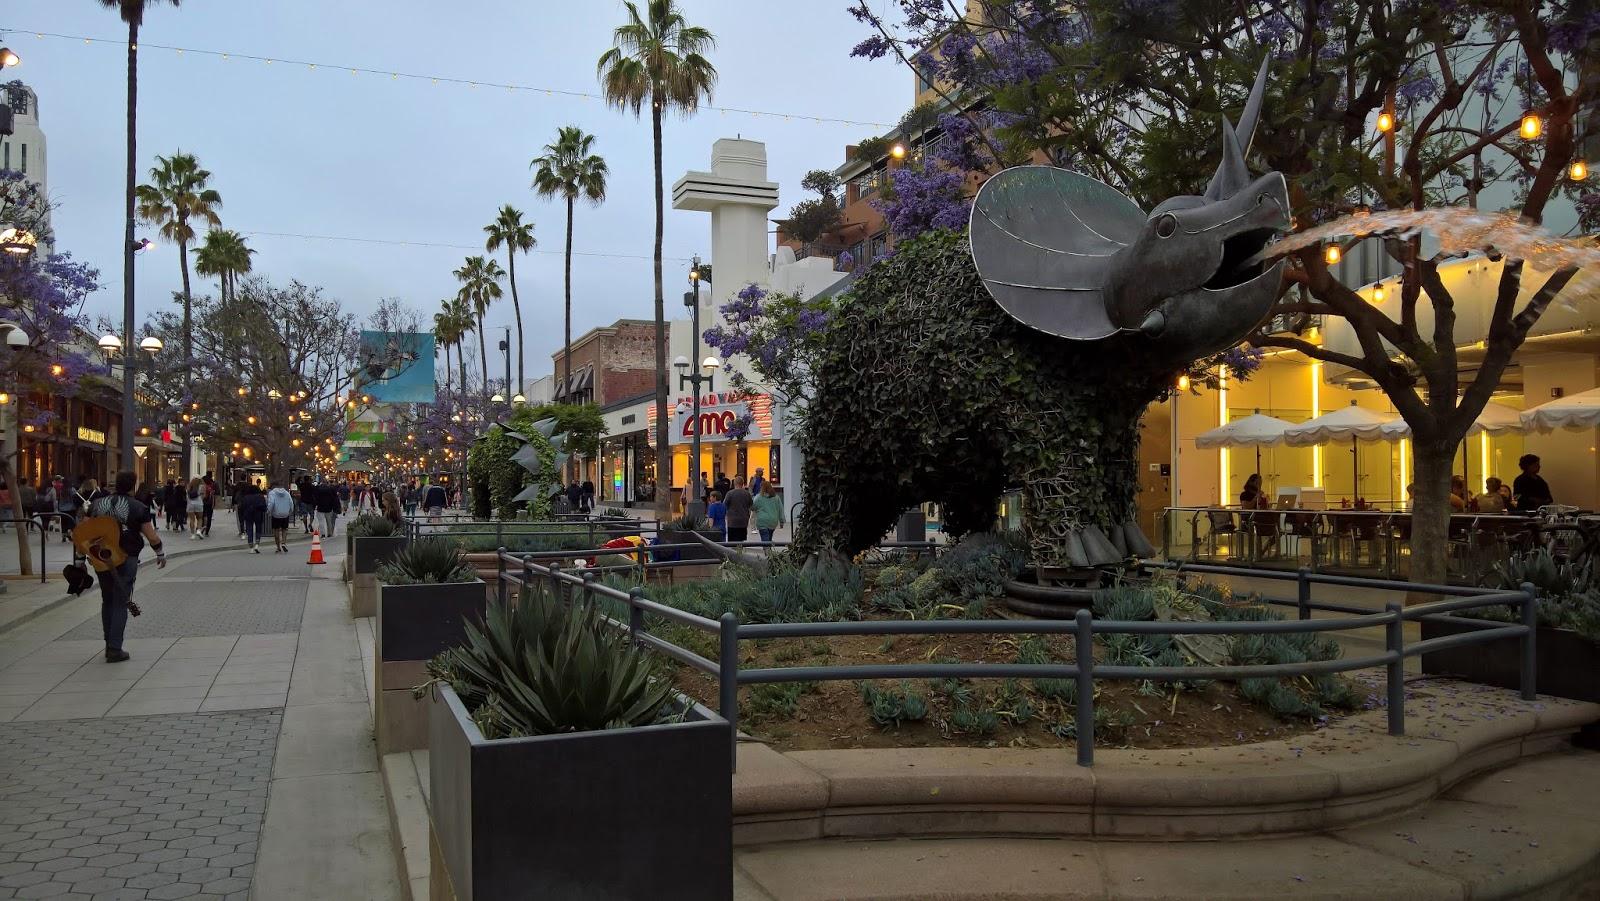 Santa Monica Los Angeles Amerikka Mallaspulla matkakertomus